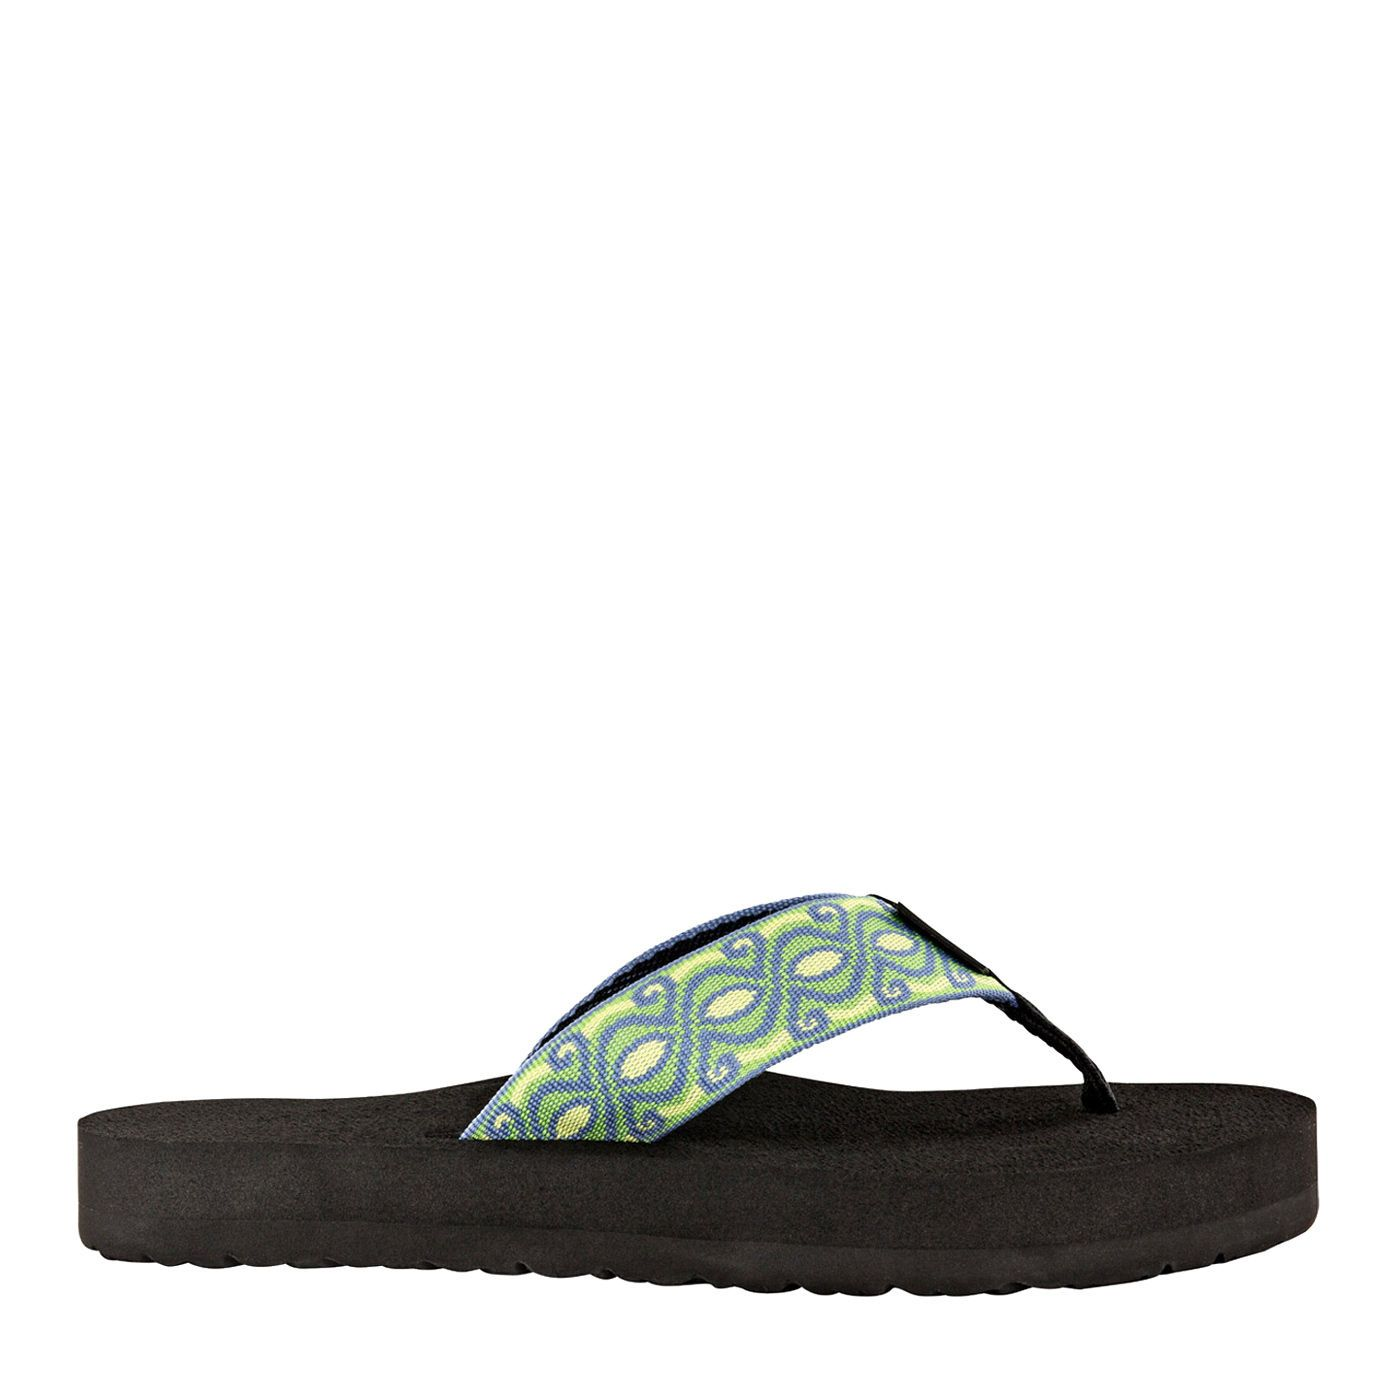 Original Mush. Flip Flops For WomenWomens Flip FlopsTeva Flip  FlopsComfortable ...